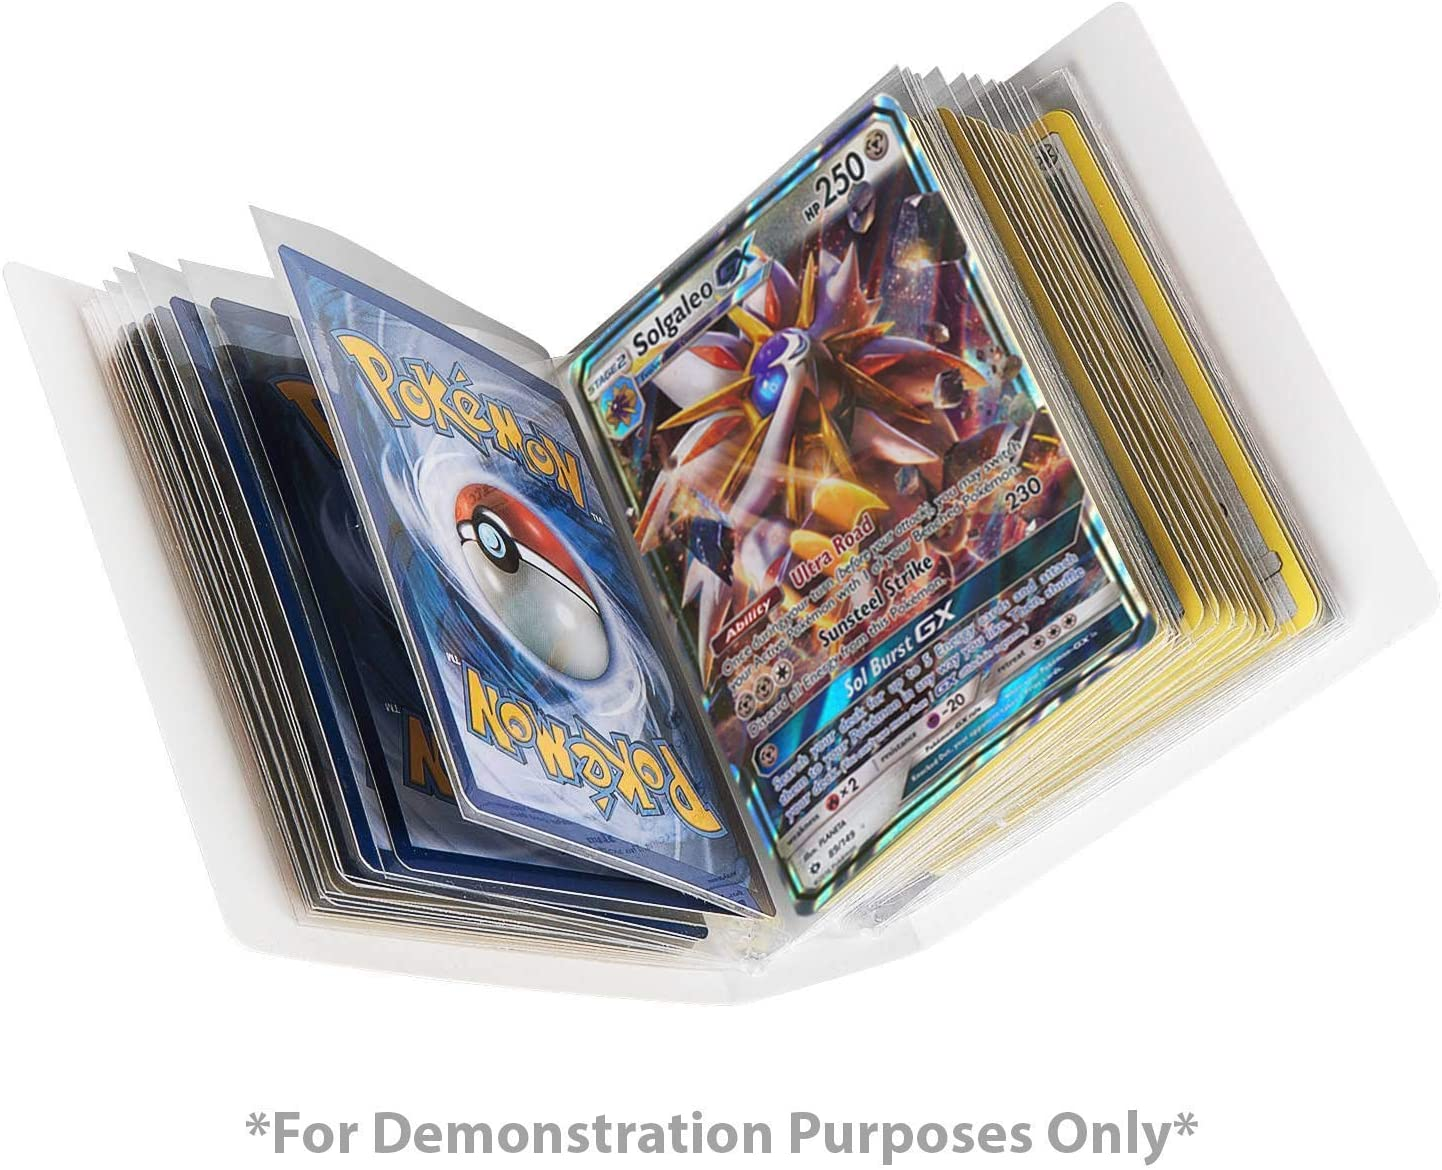 Pokemon Ultimate 500 Card Instant Collection *NO DUPLICATES* Pokemon lanyard!